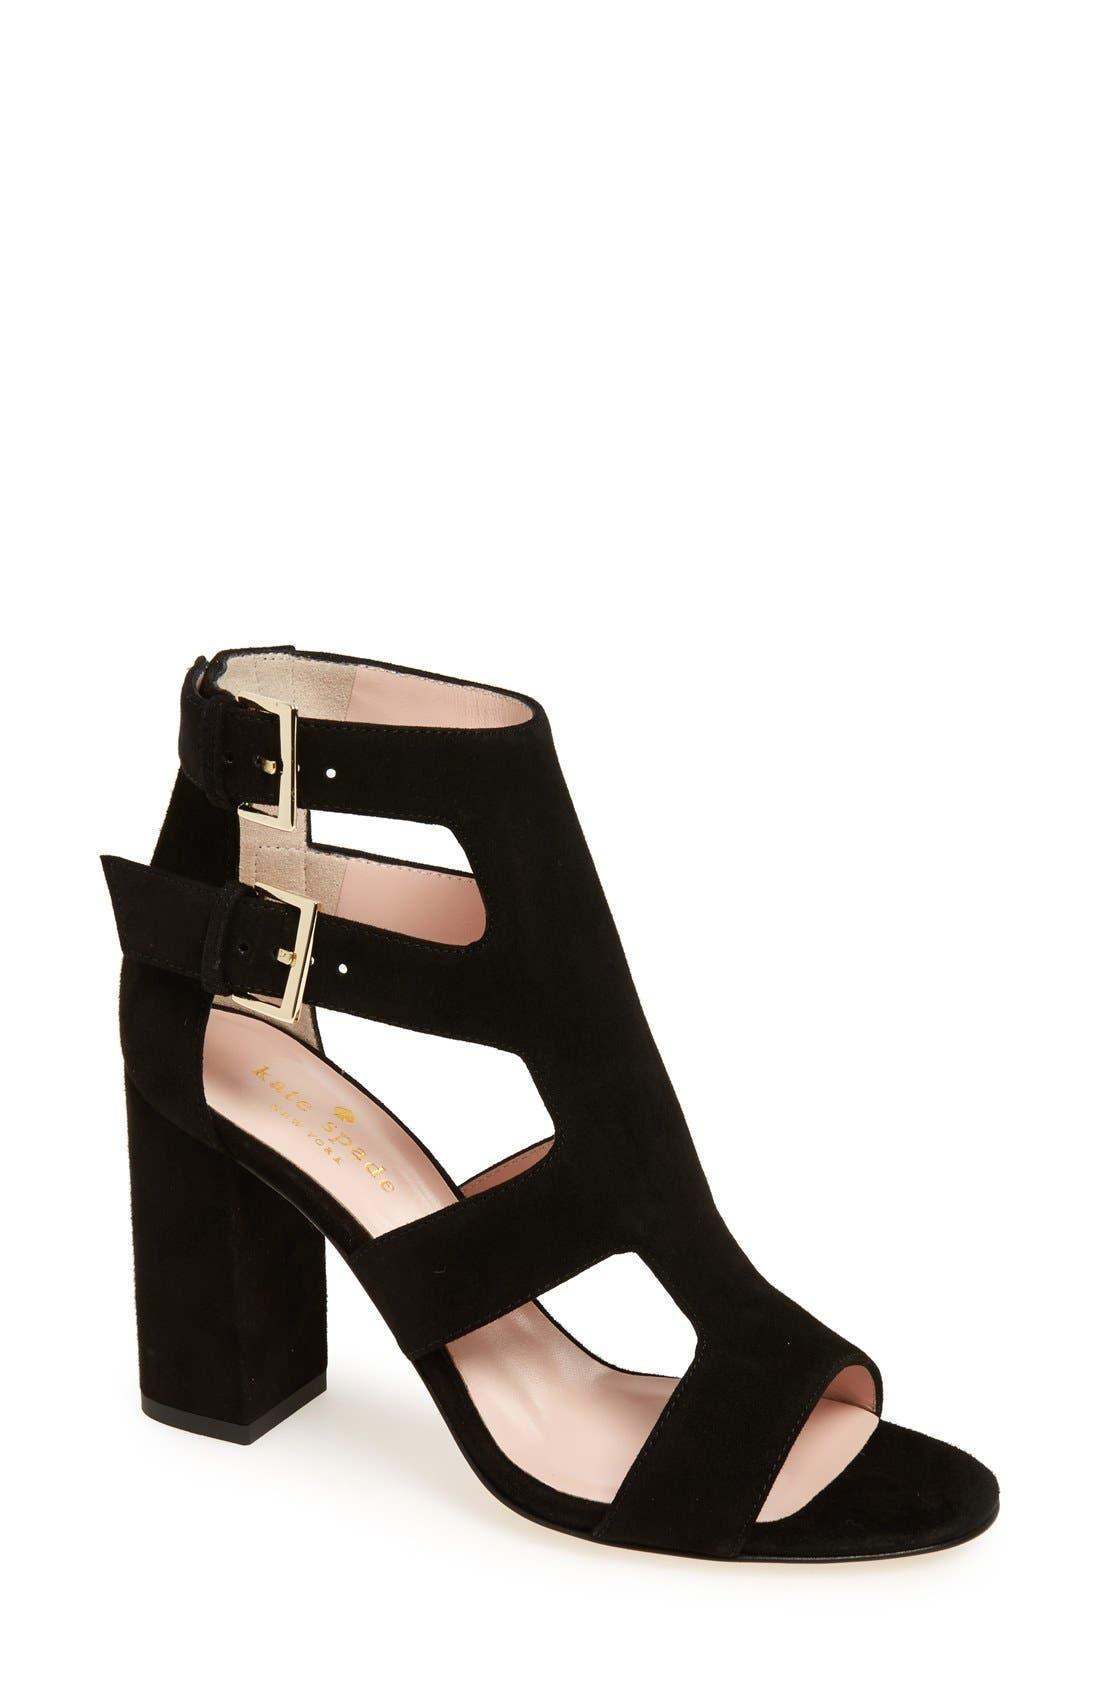 Main Image - kate spade new york 'ilemi' block heel sandal (Women)